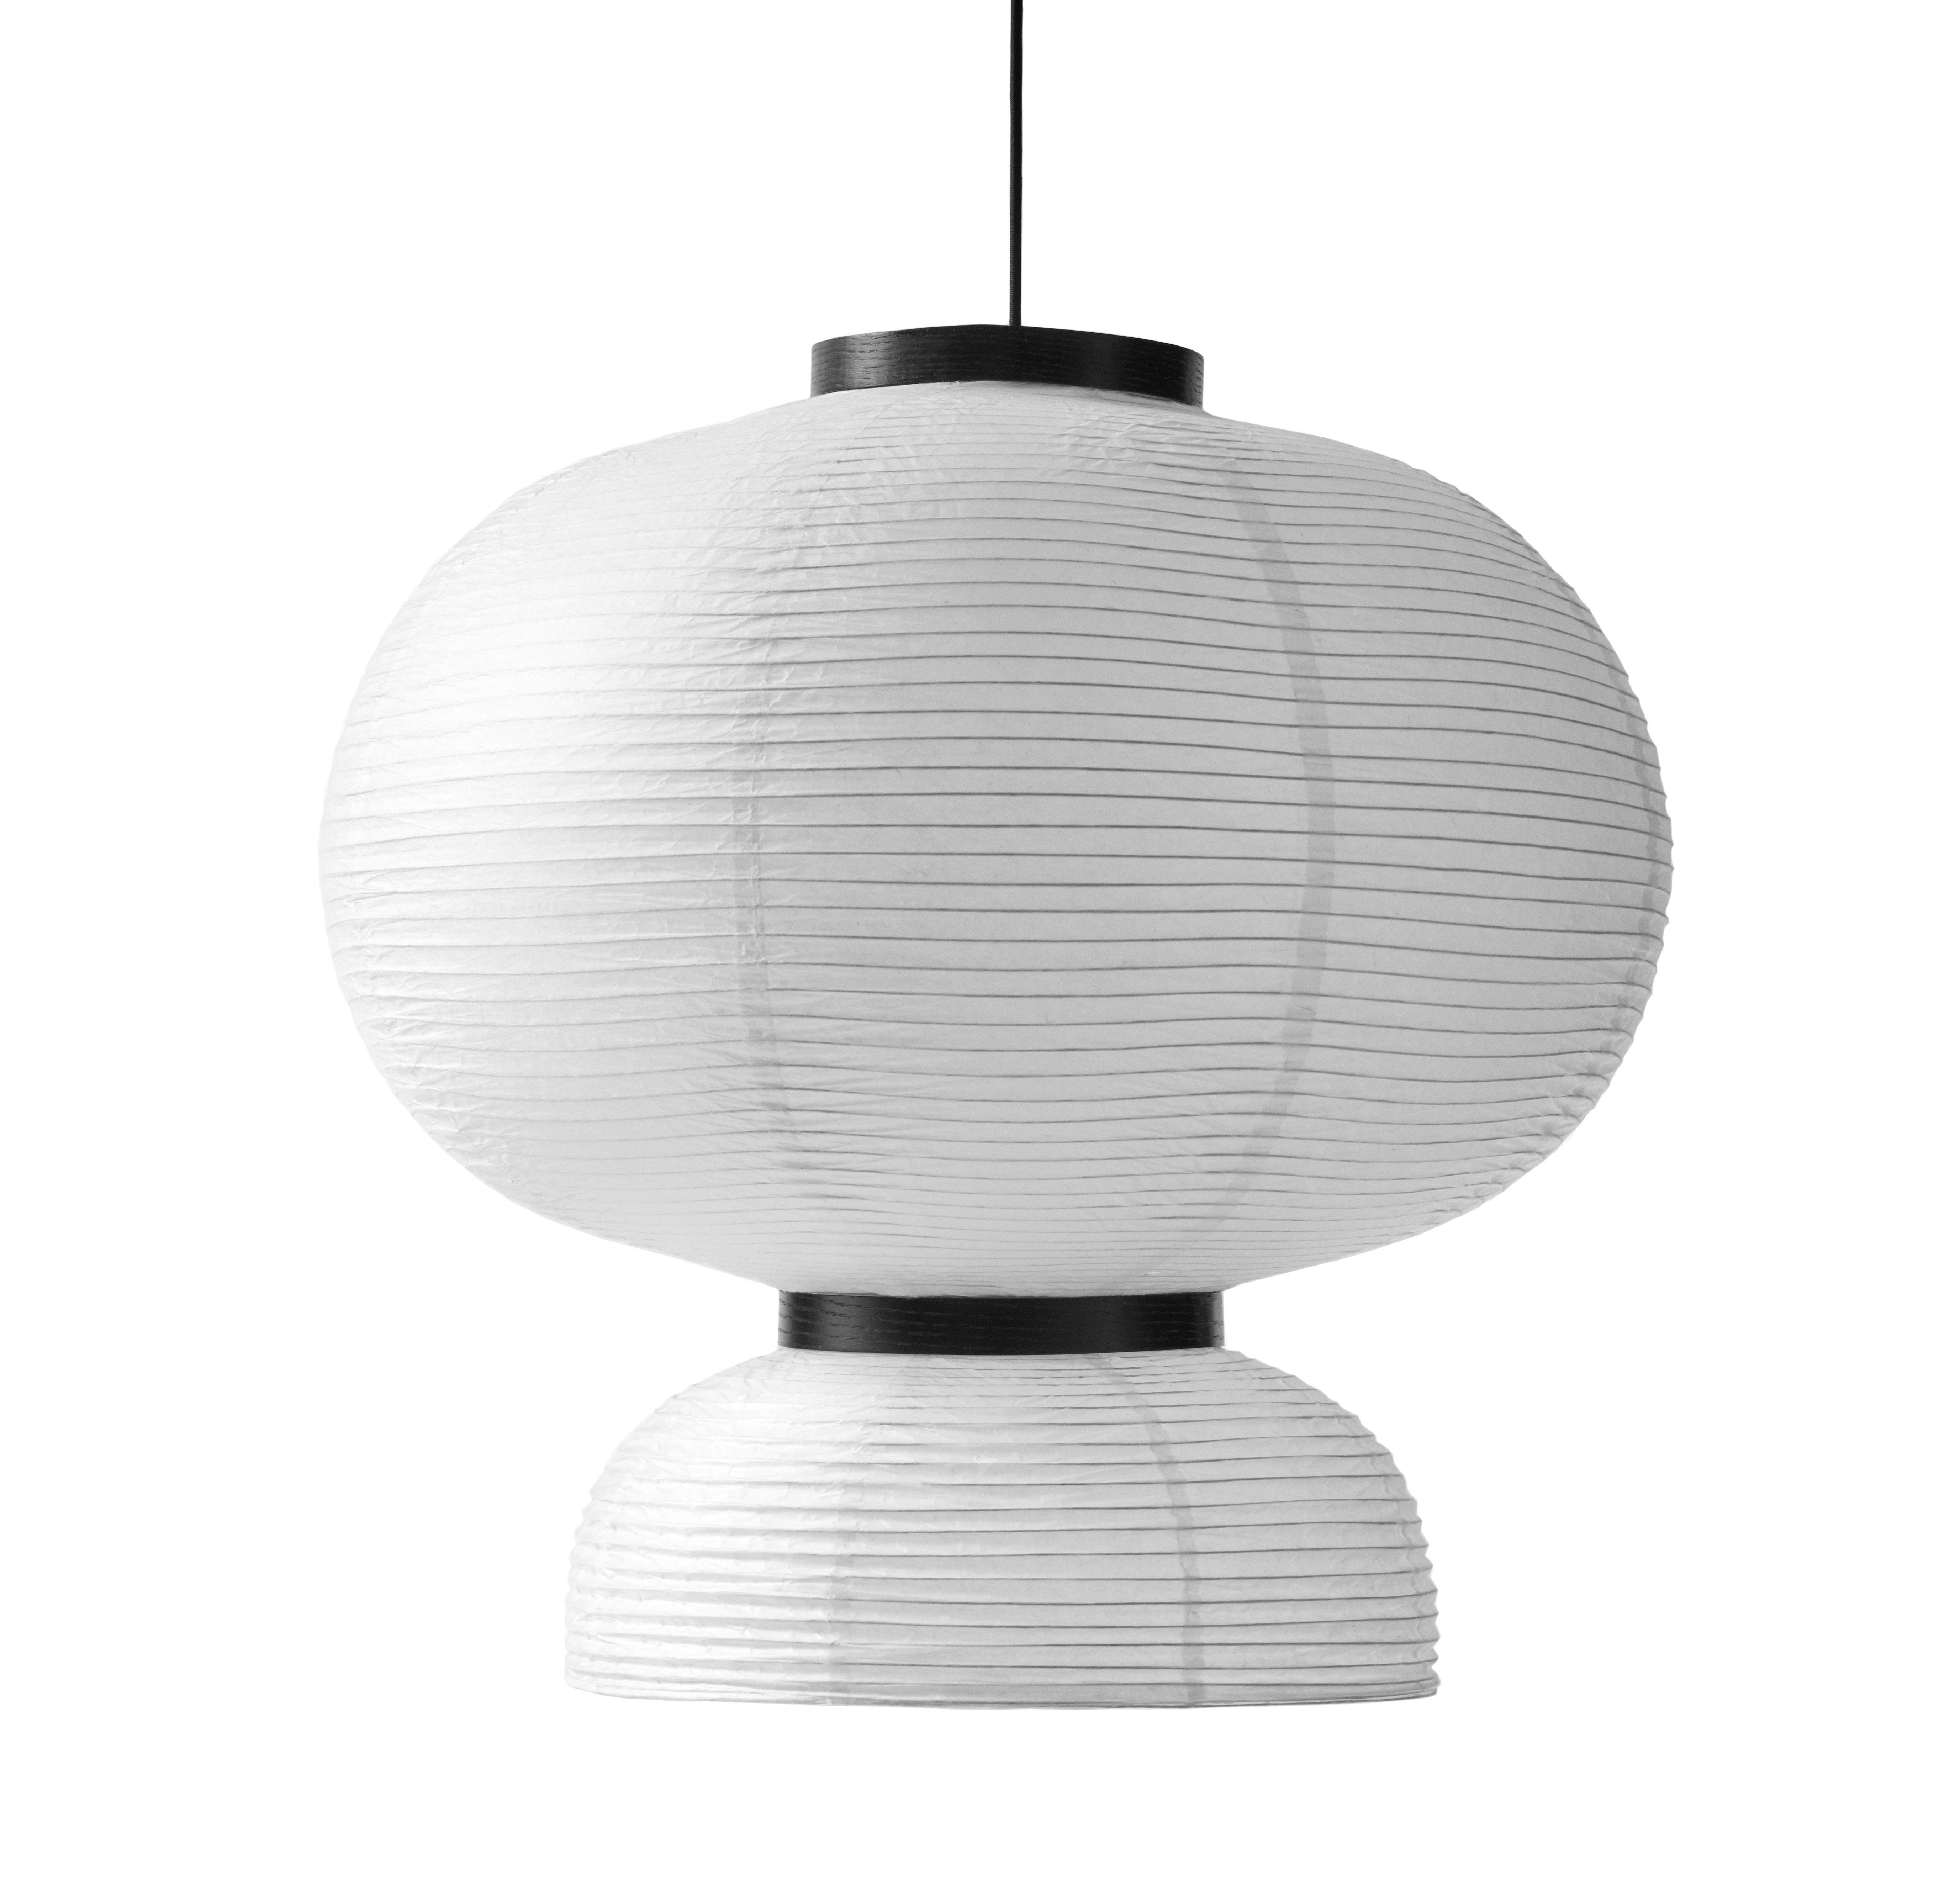 suspension formakami jh5 70 x h 67 cm blanc ivoire noir tradition made in design. Black Bedroom Furniture Sets. Home Design Ideas